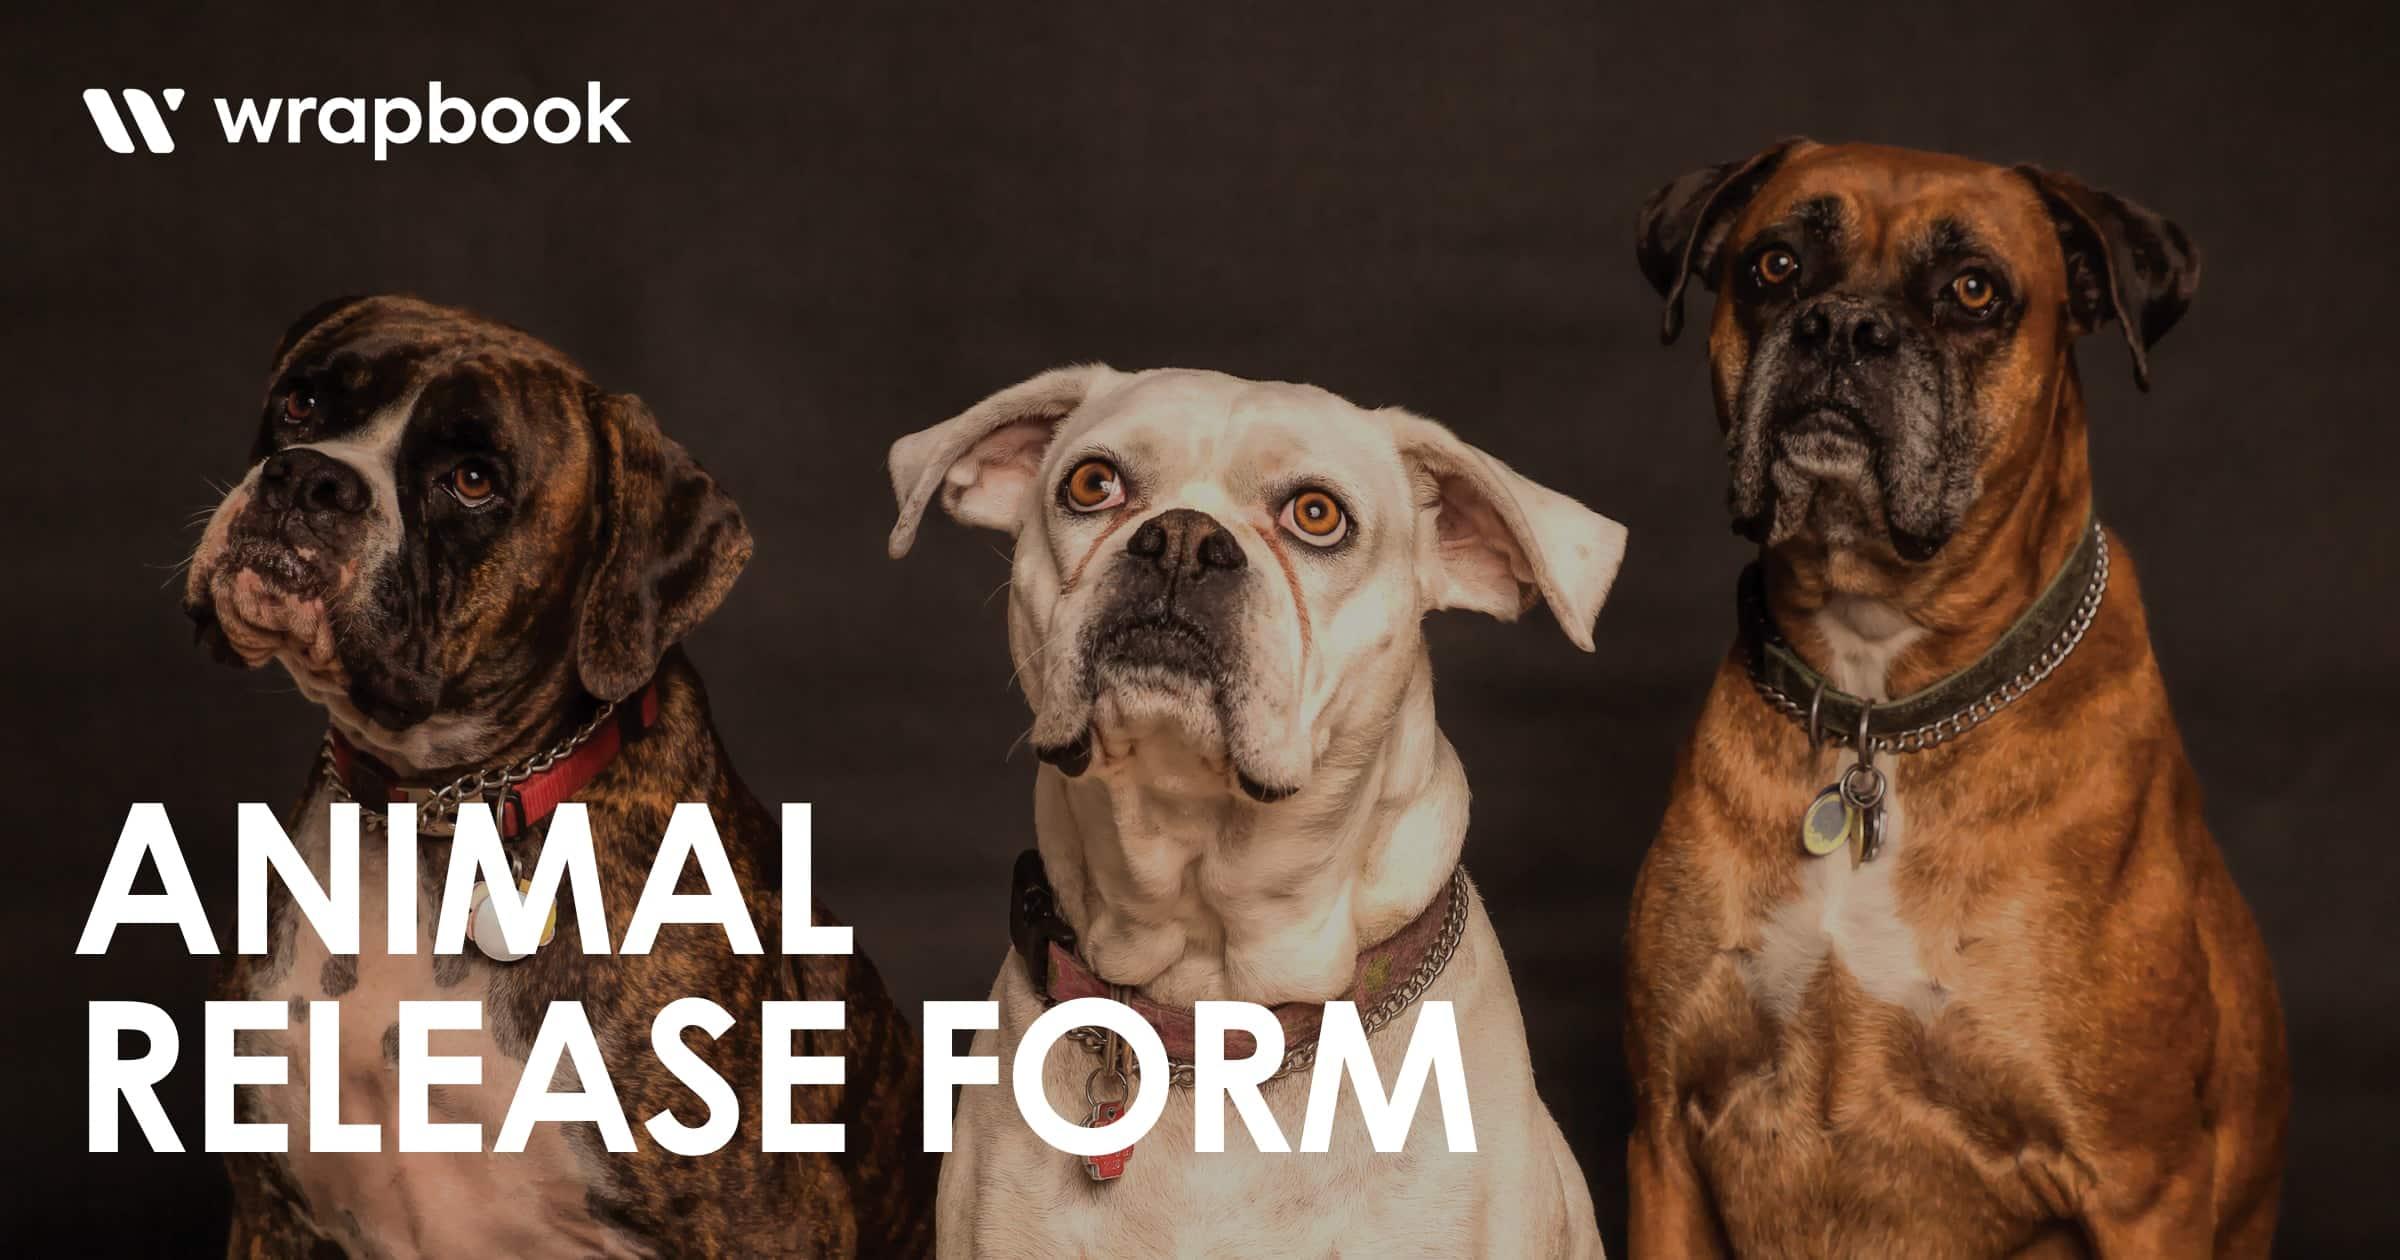 Model Release Form - Animal Release Form - Wrapbook